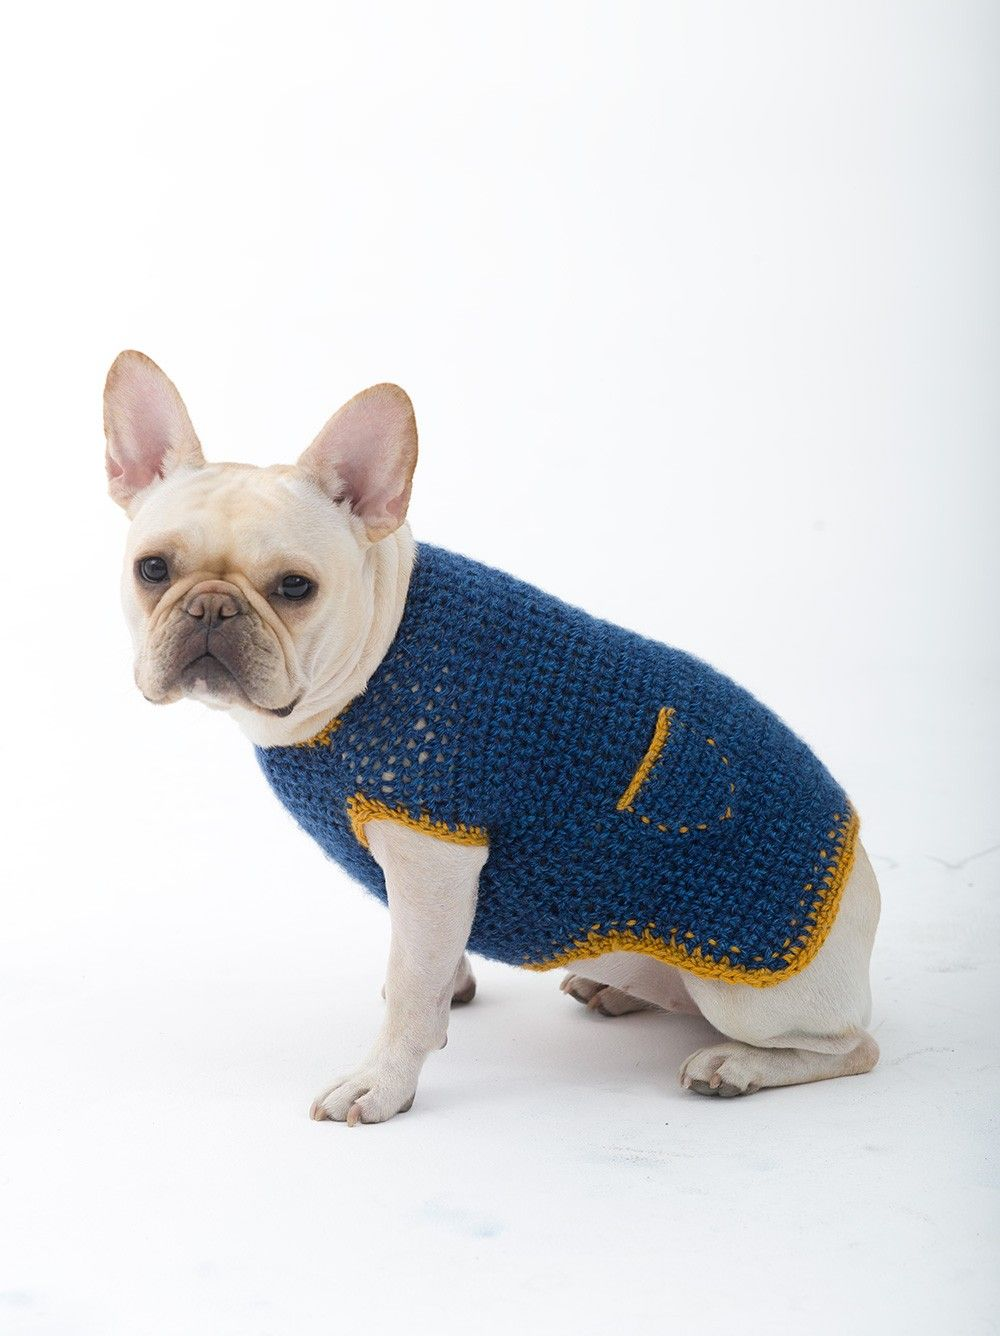 The Casual Friday Dog Sweater Pattern (Crochet) | crochet pattern ...